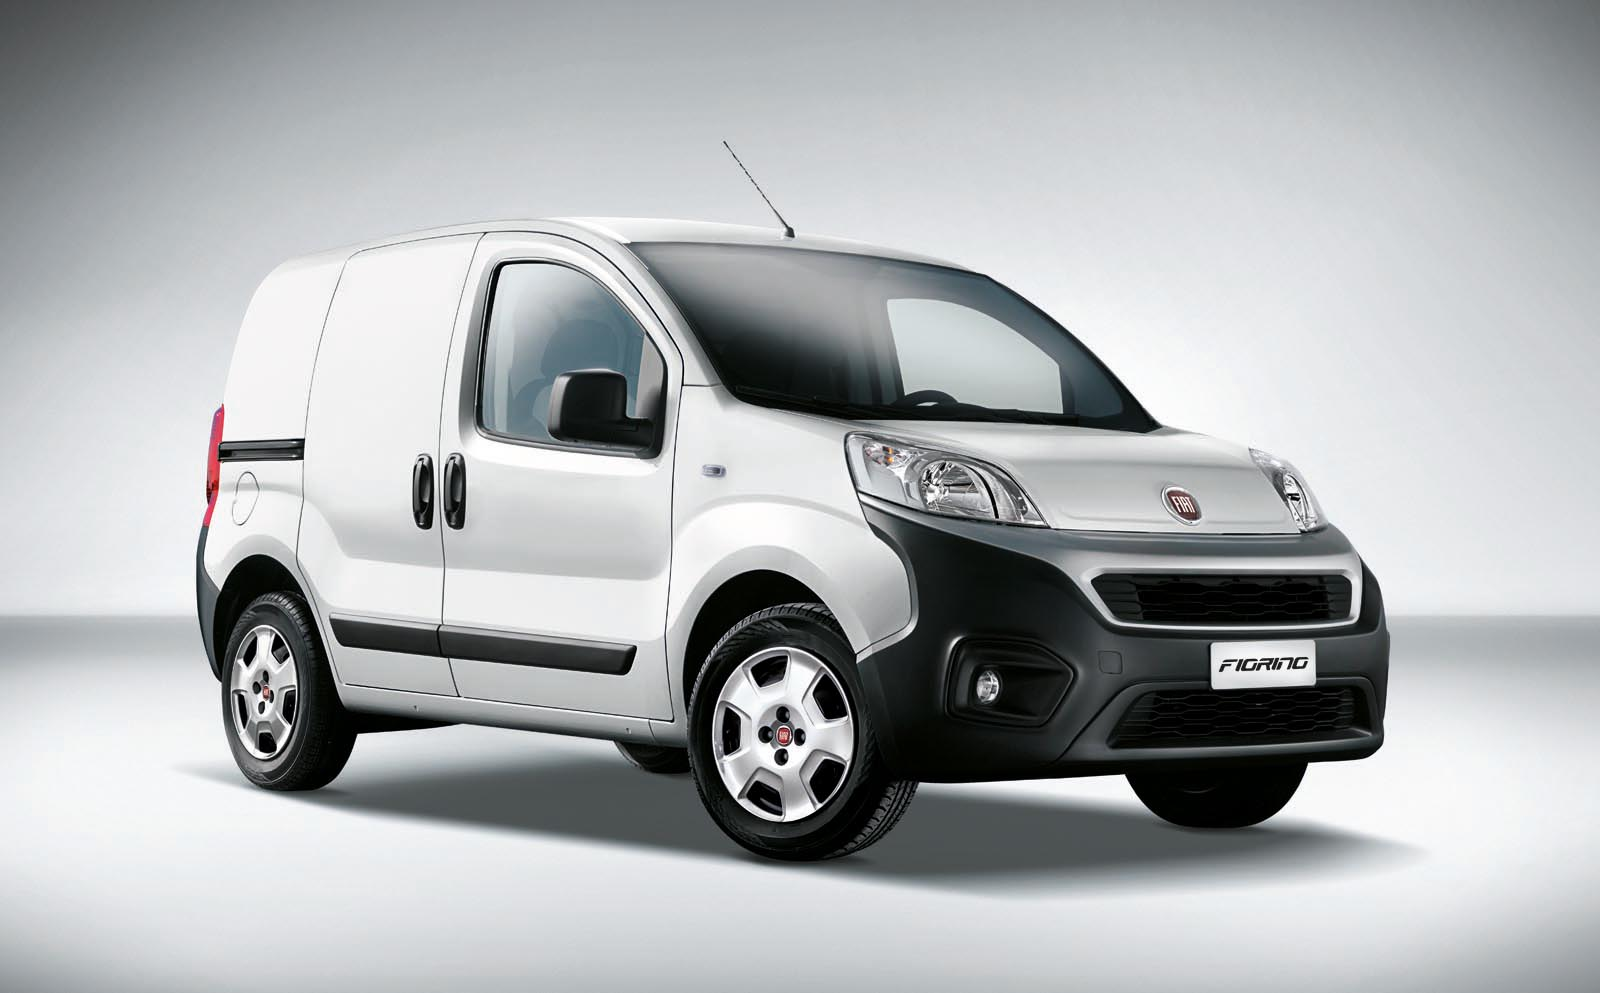 Photo of Νέα γκάμα Fiat Fiorino σε τιμή που δελεάζει!